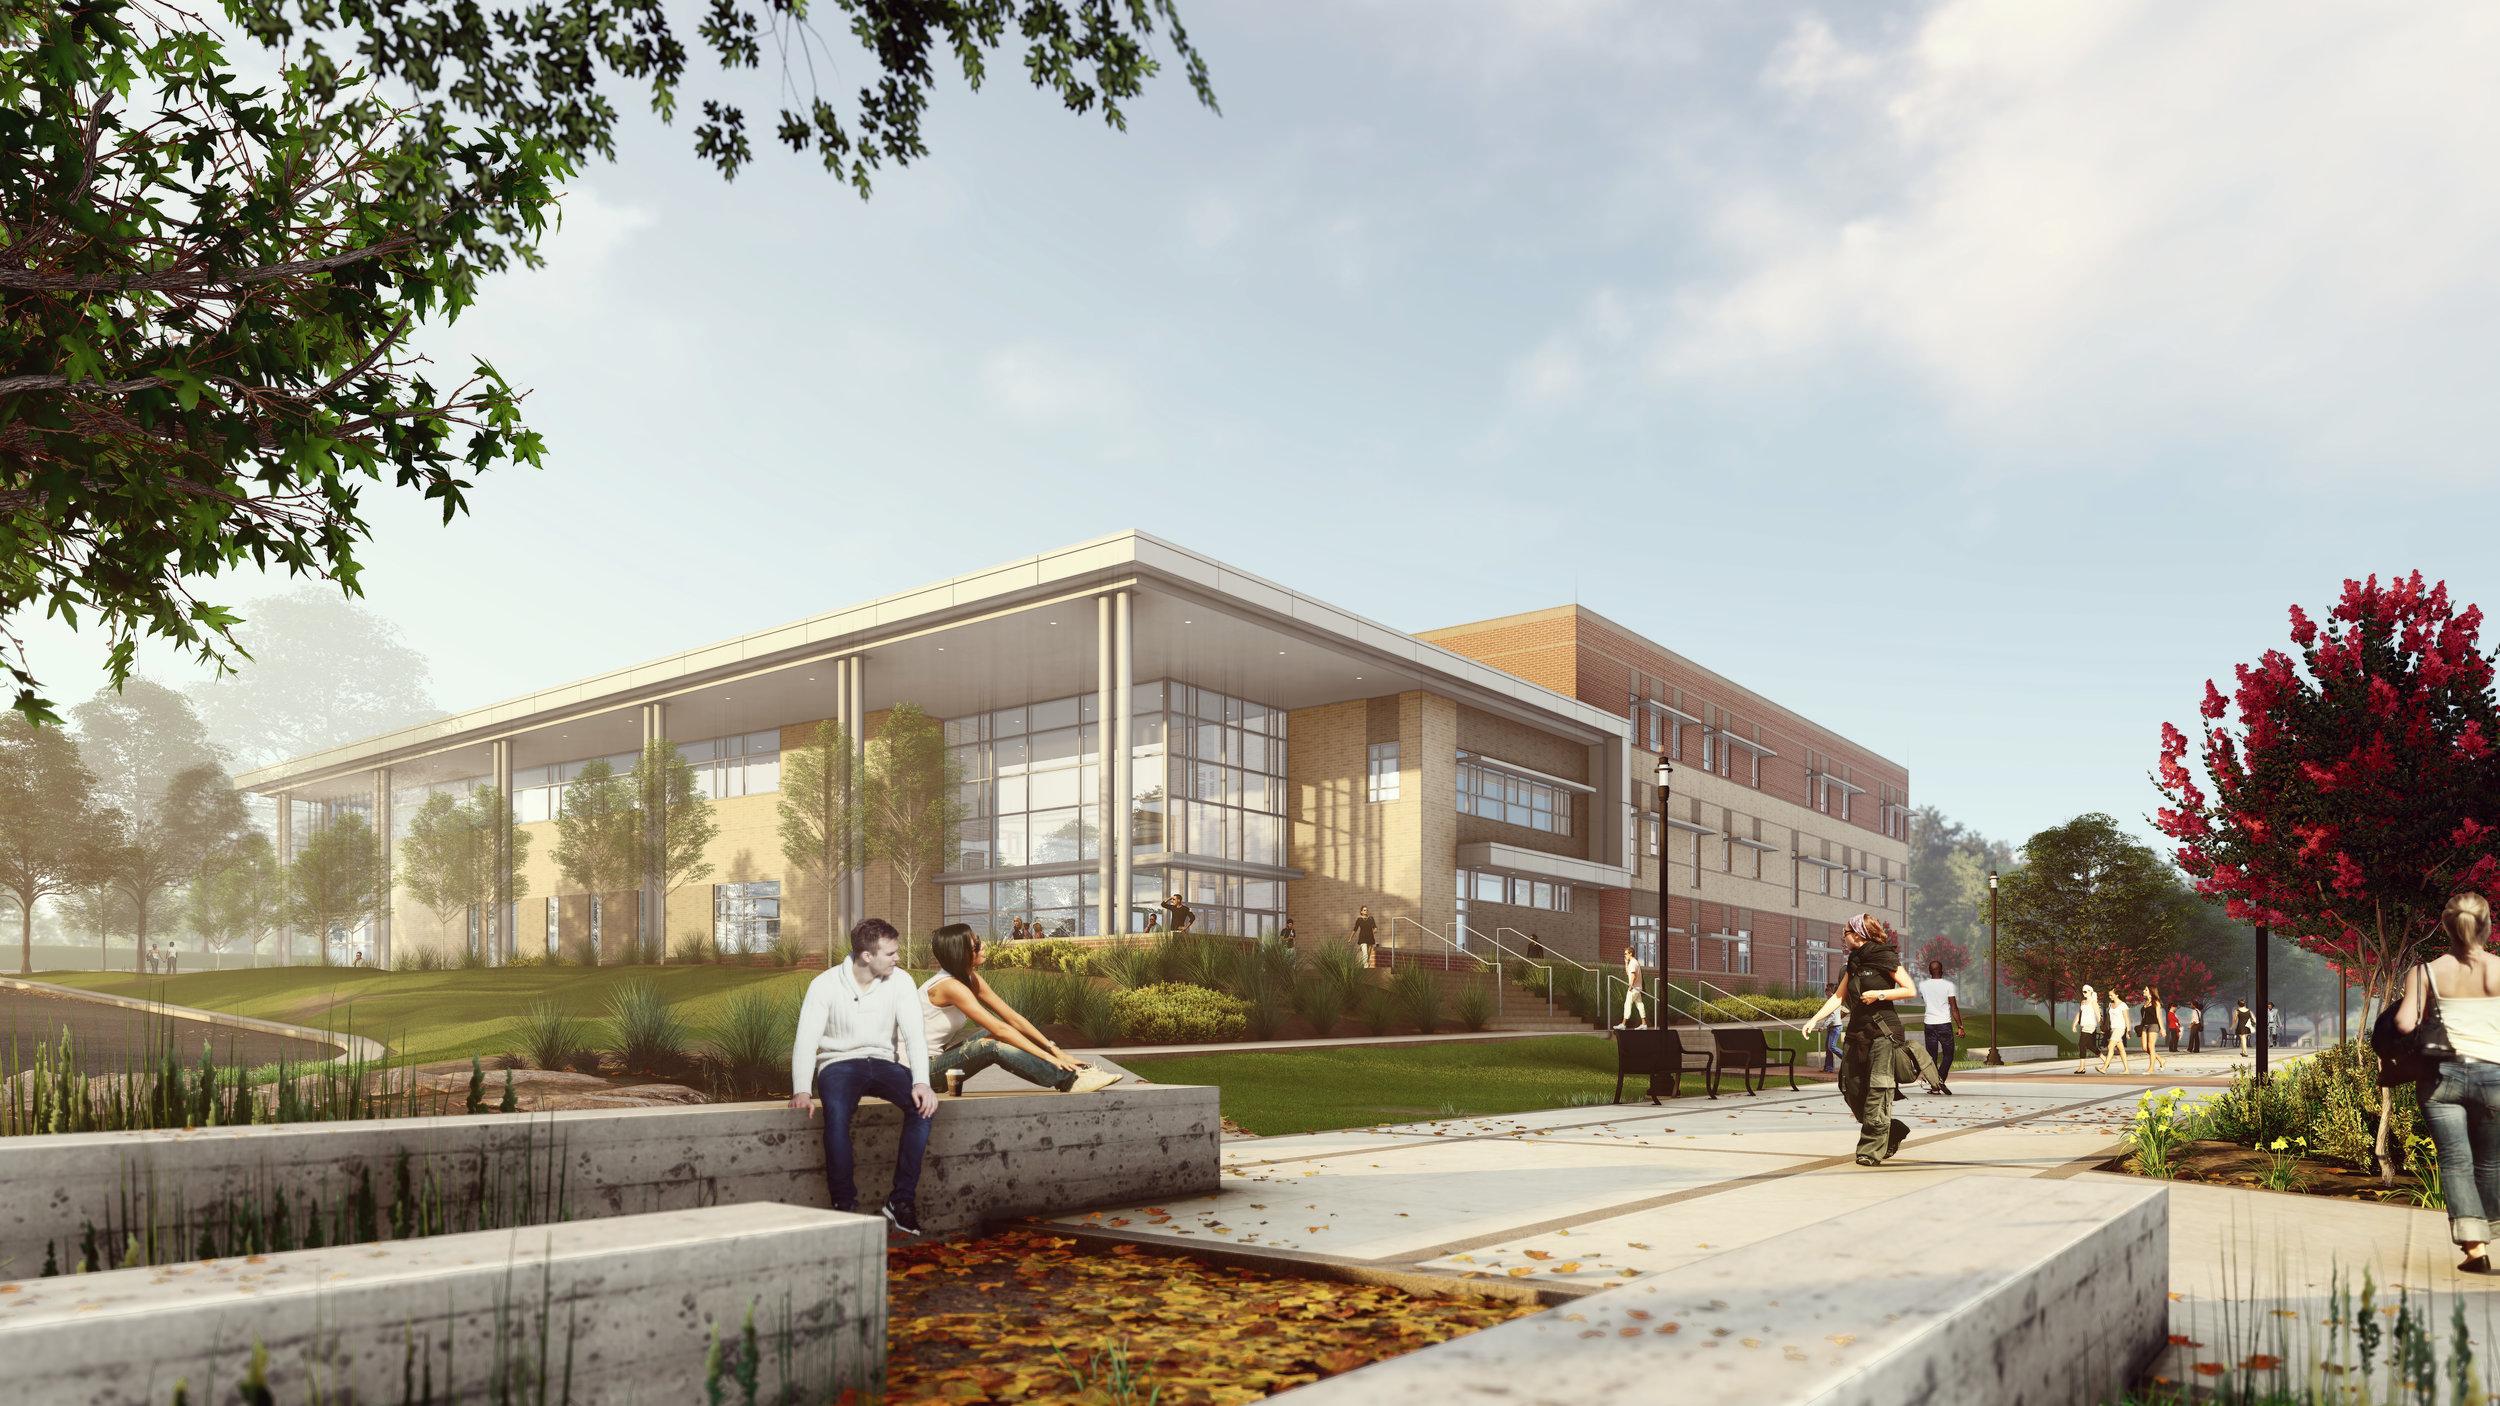 cpcc merancas phase iv classroom building